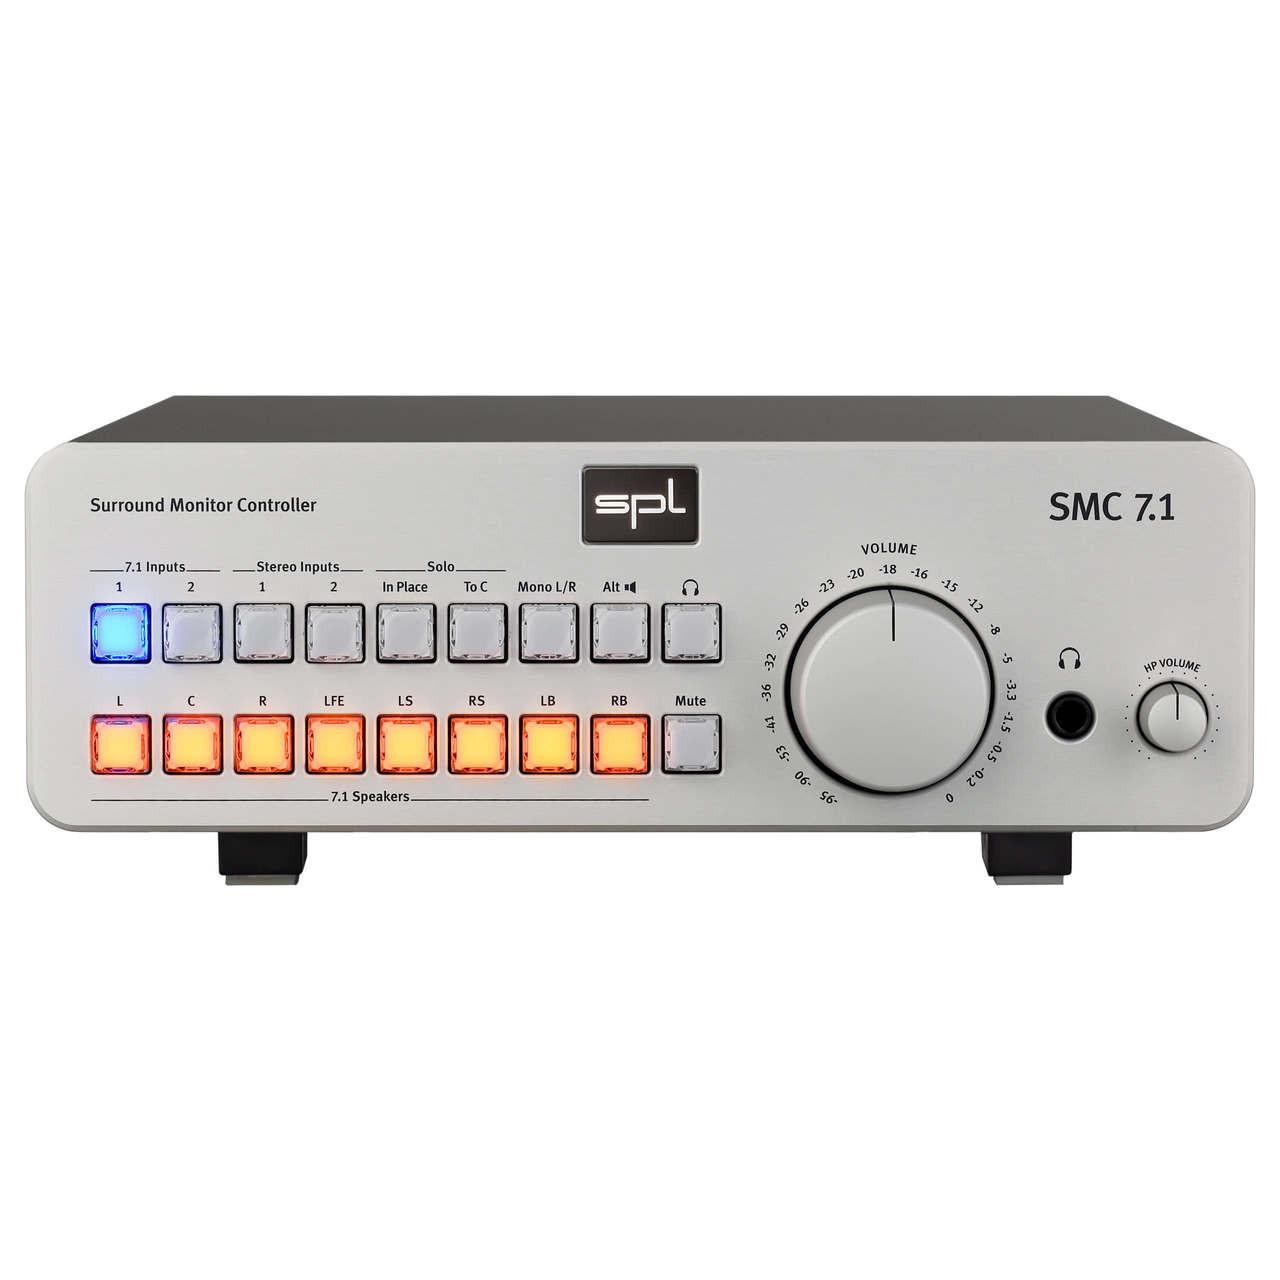 SMC 7.1 Silver (Front)